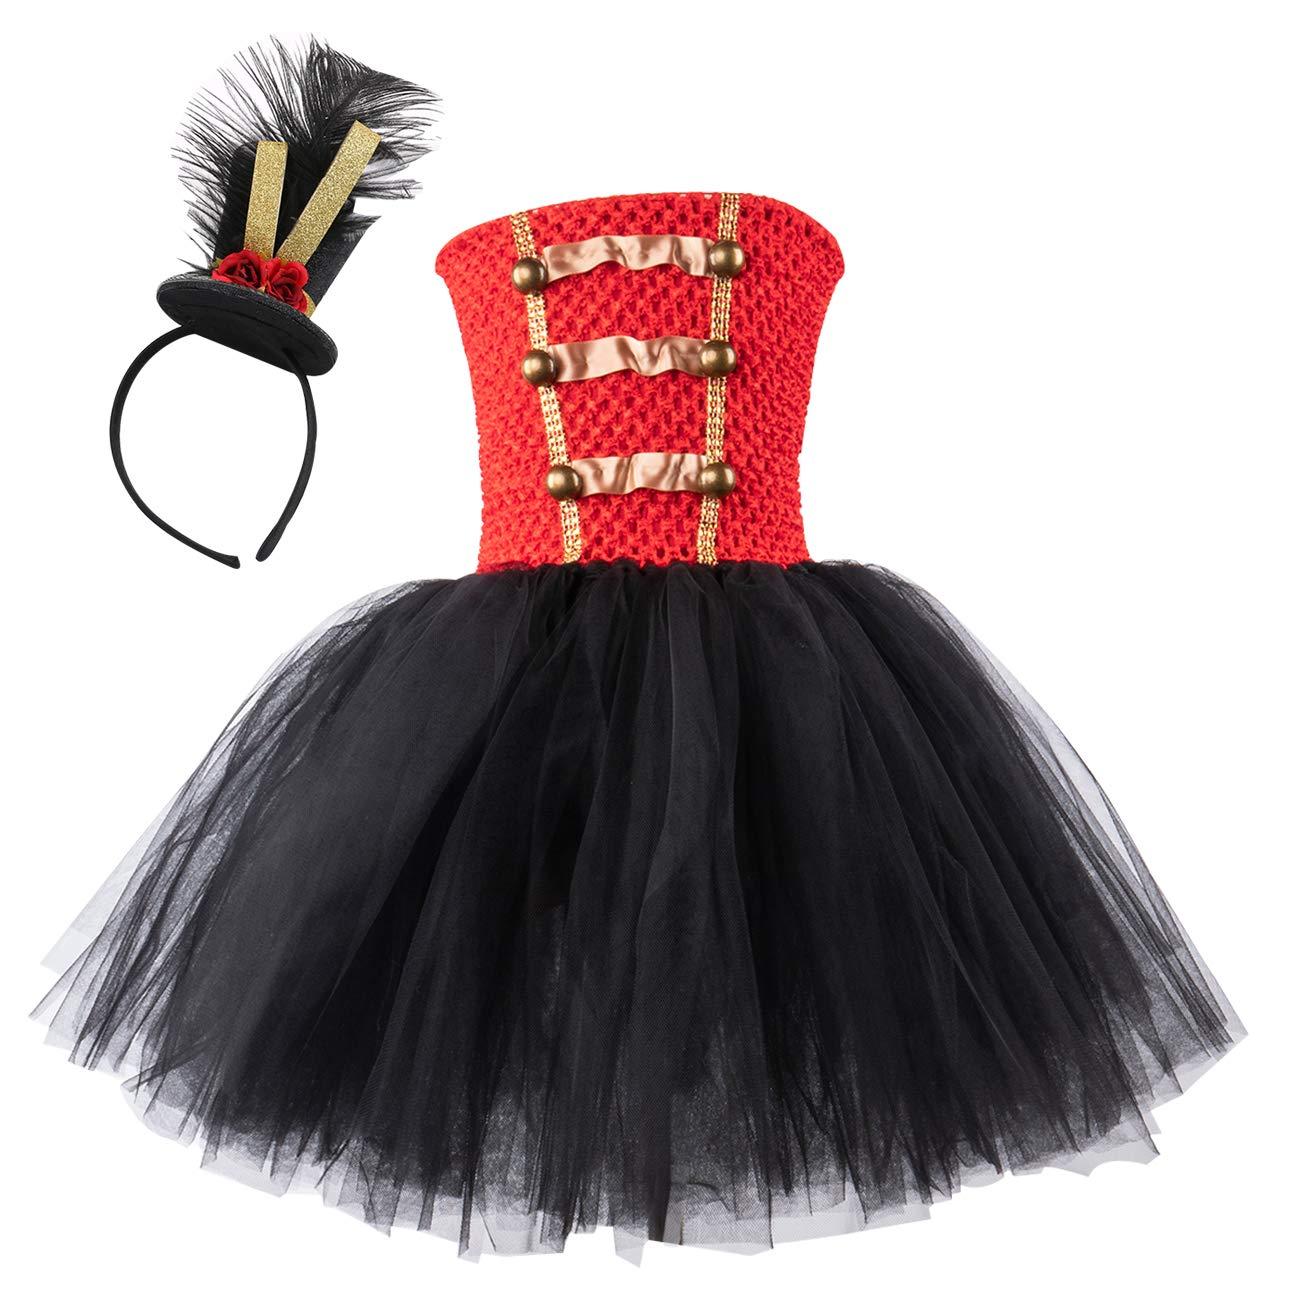 AQTOPS Girls Circus Nutcracker Costumes Drum Majorette Tutu Dress Size 4 Red and Black